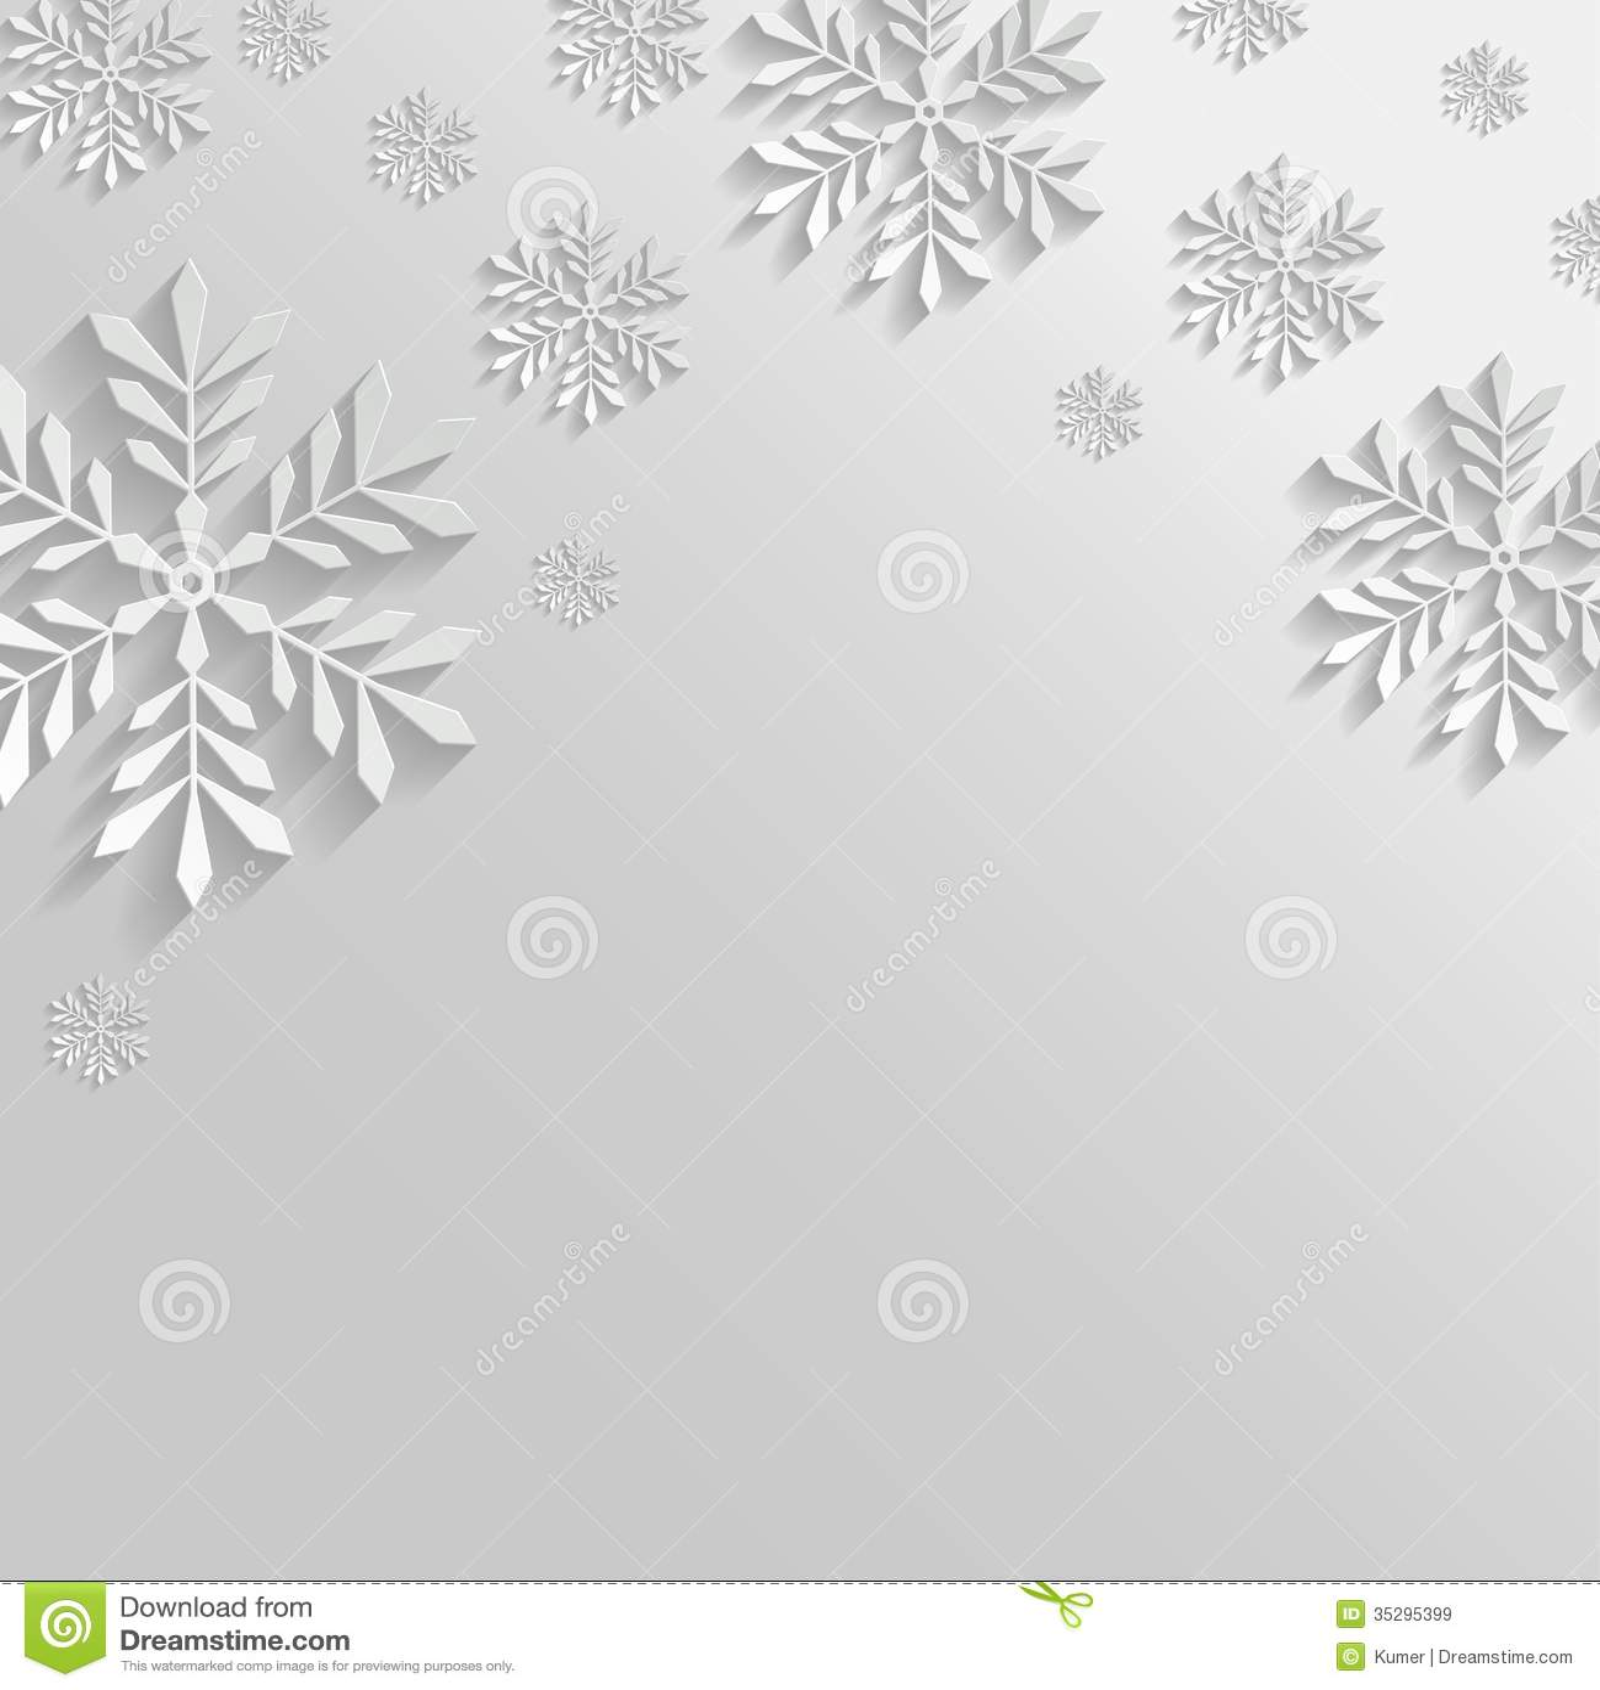 White snowflakes no background imgkid the